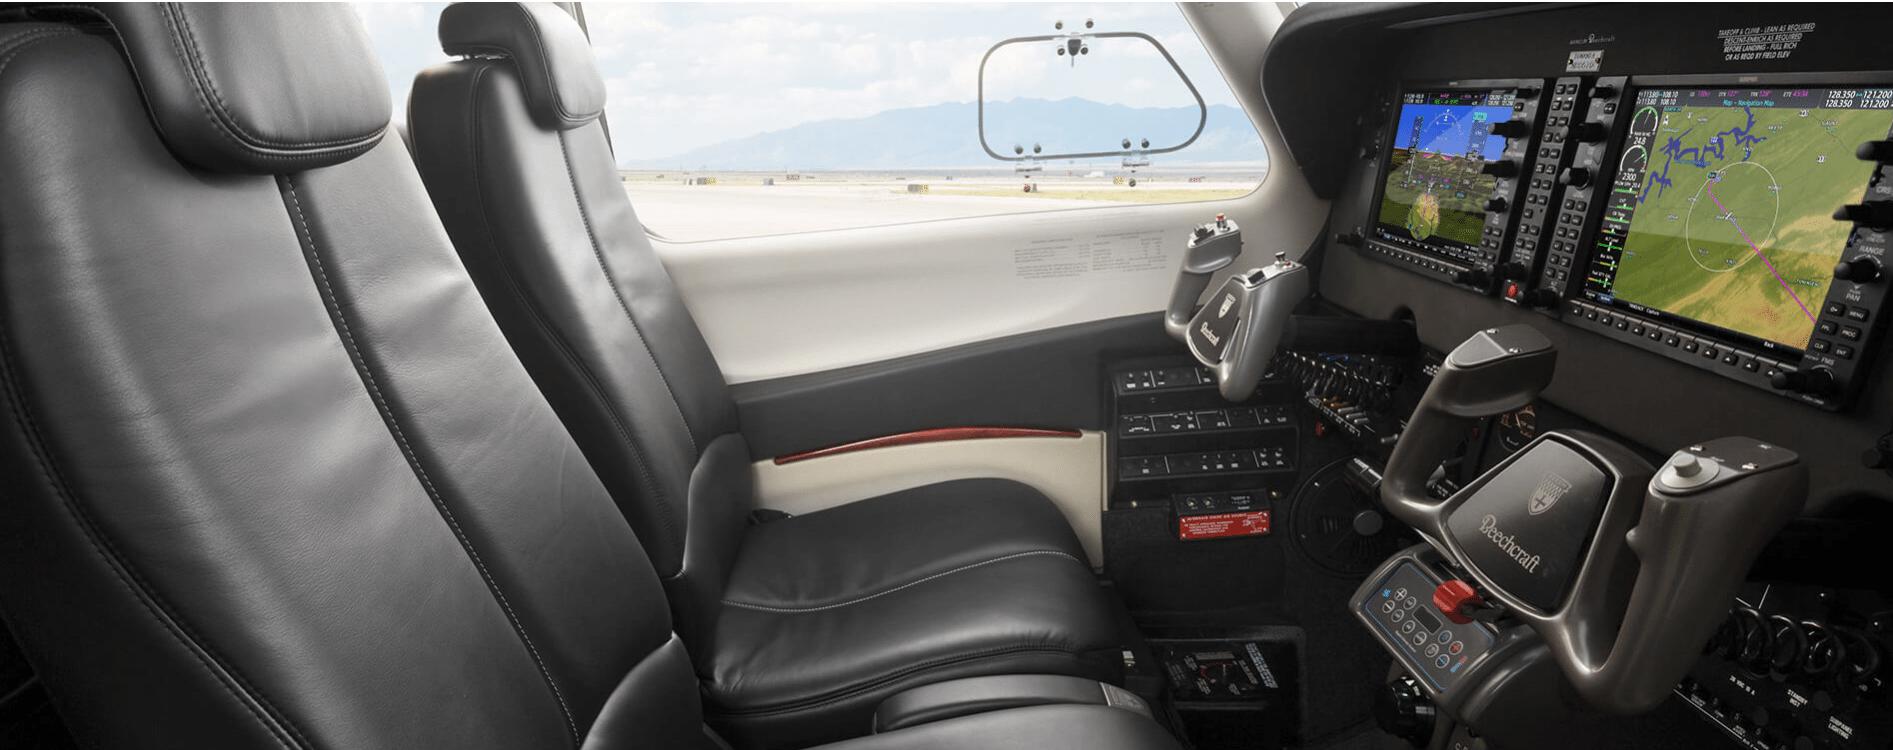 bonanza G36 avionics